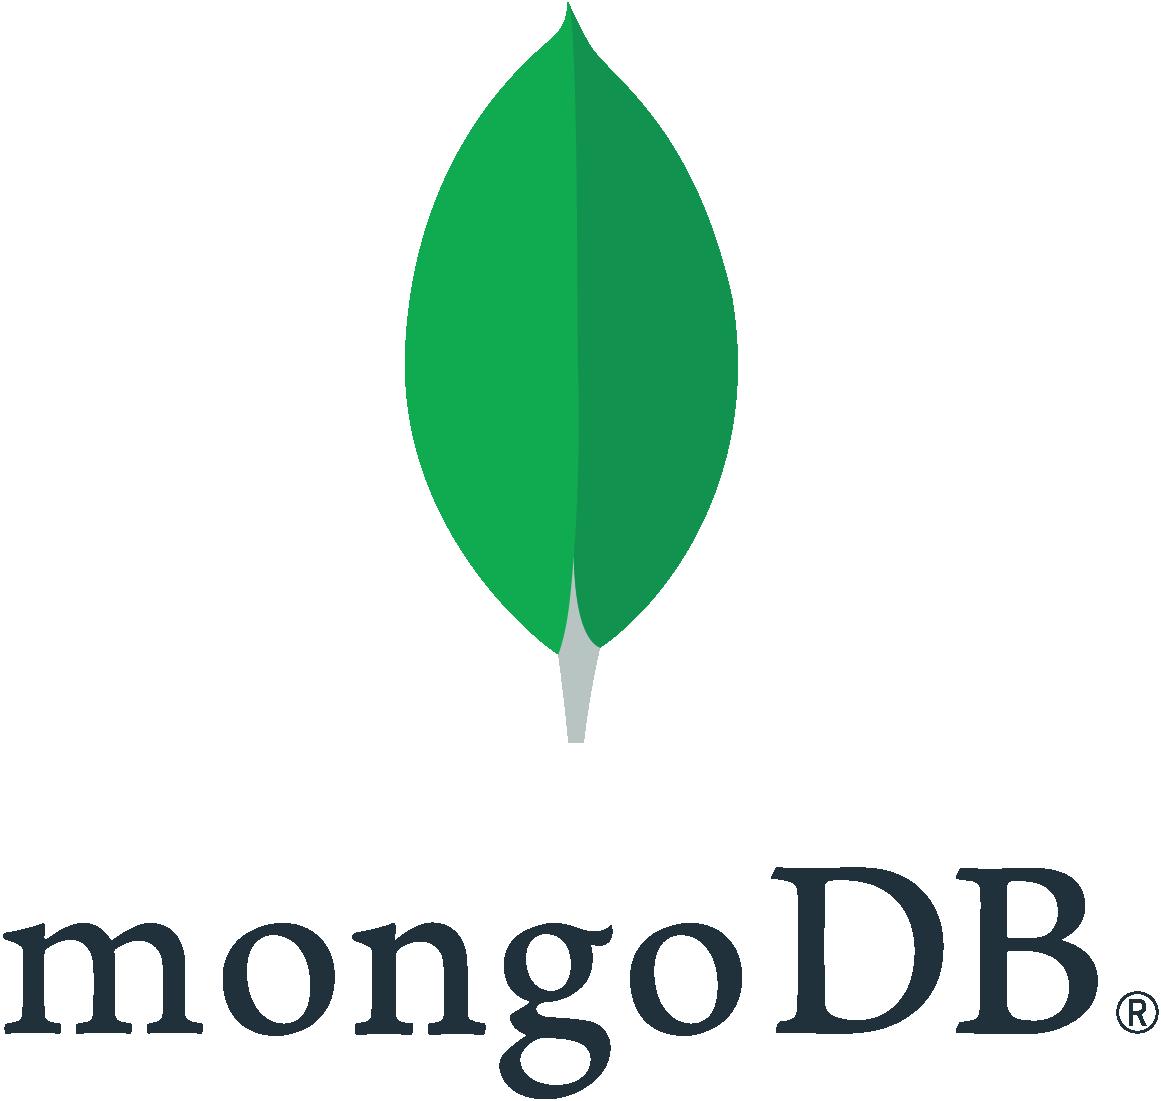 86917e5c-1b98-40db-88f2-ee6095a54b8d-company_logo-MongoDB_LogoStacked_FullColorBlack_RGB